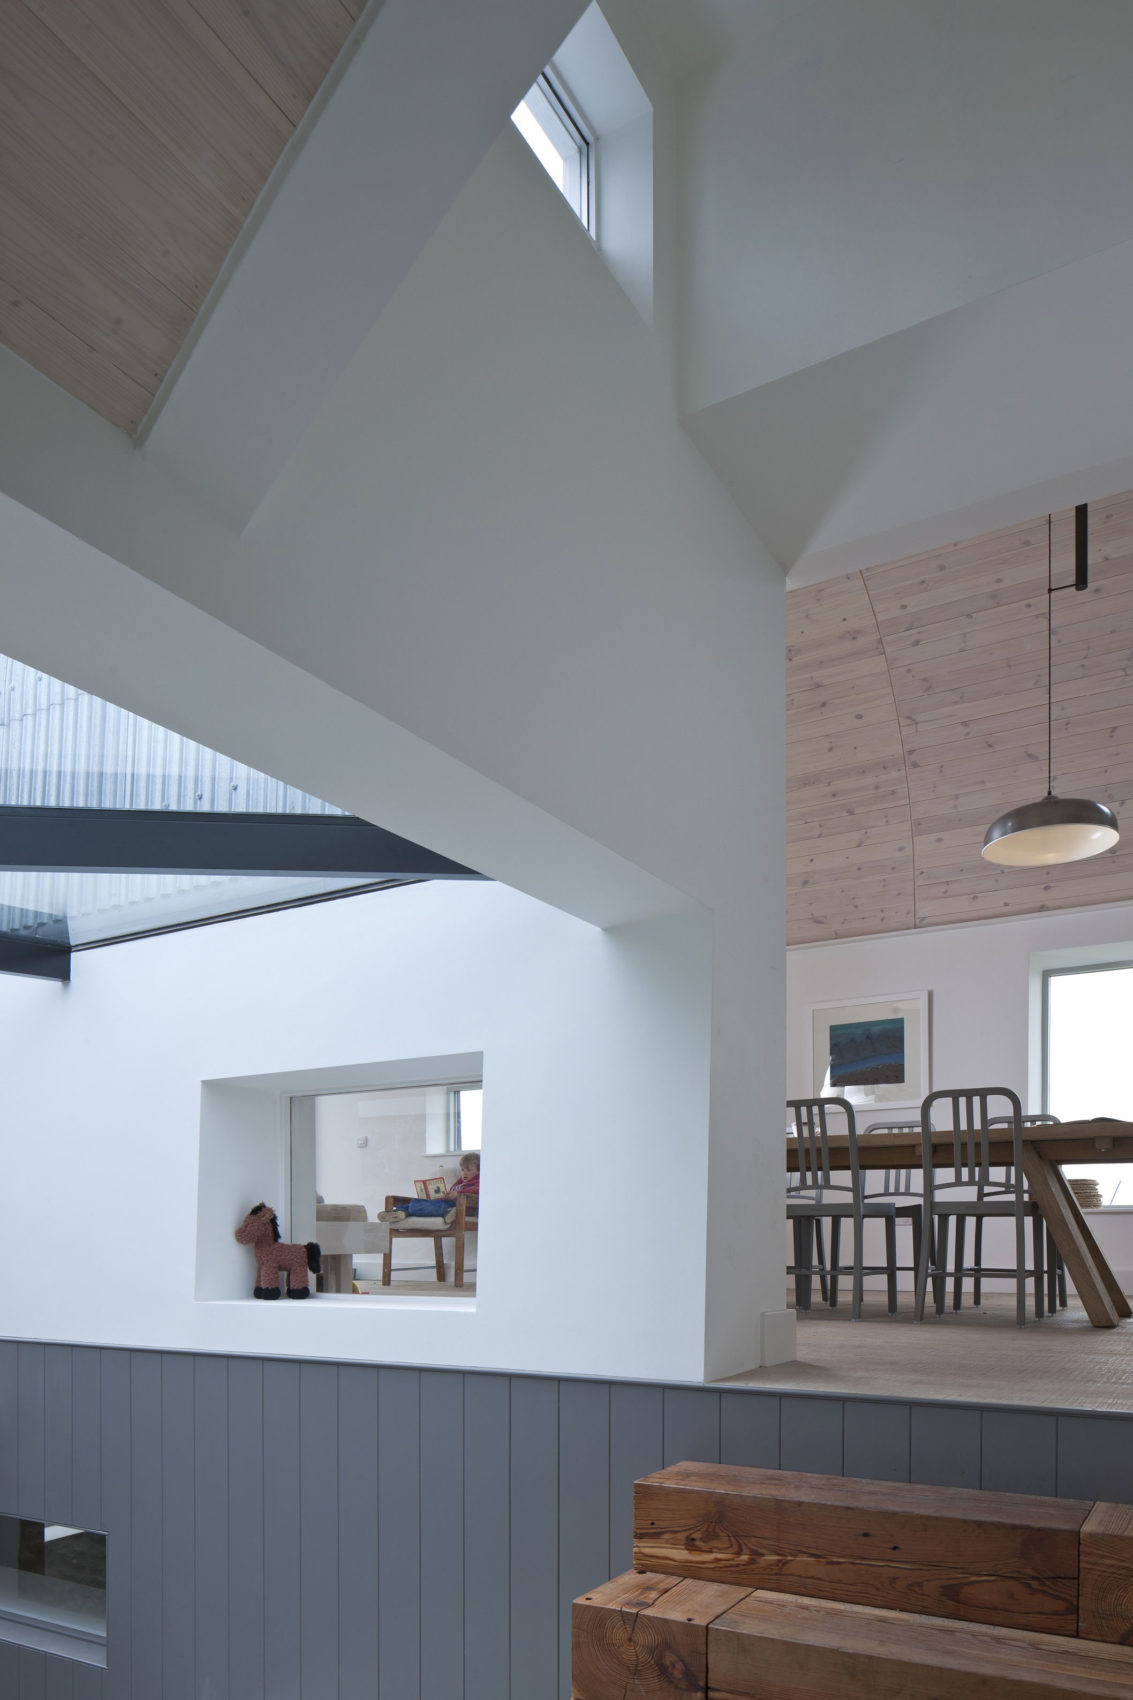 House Number 7 by Denizen Works (12)